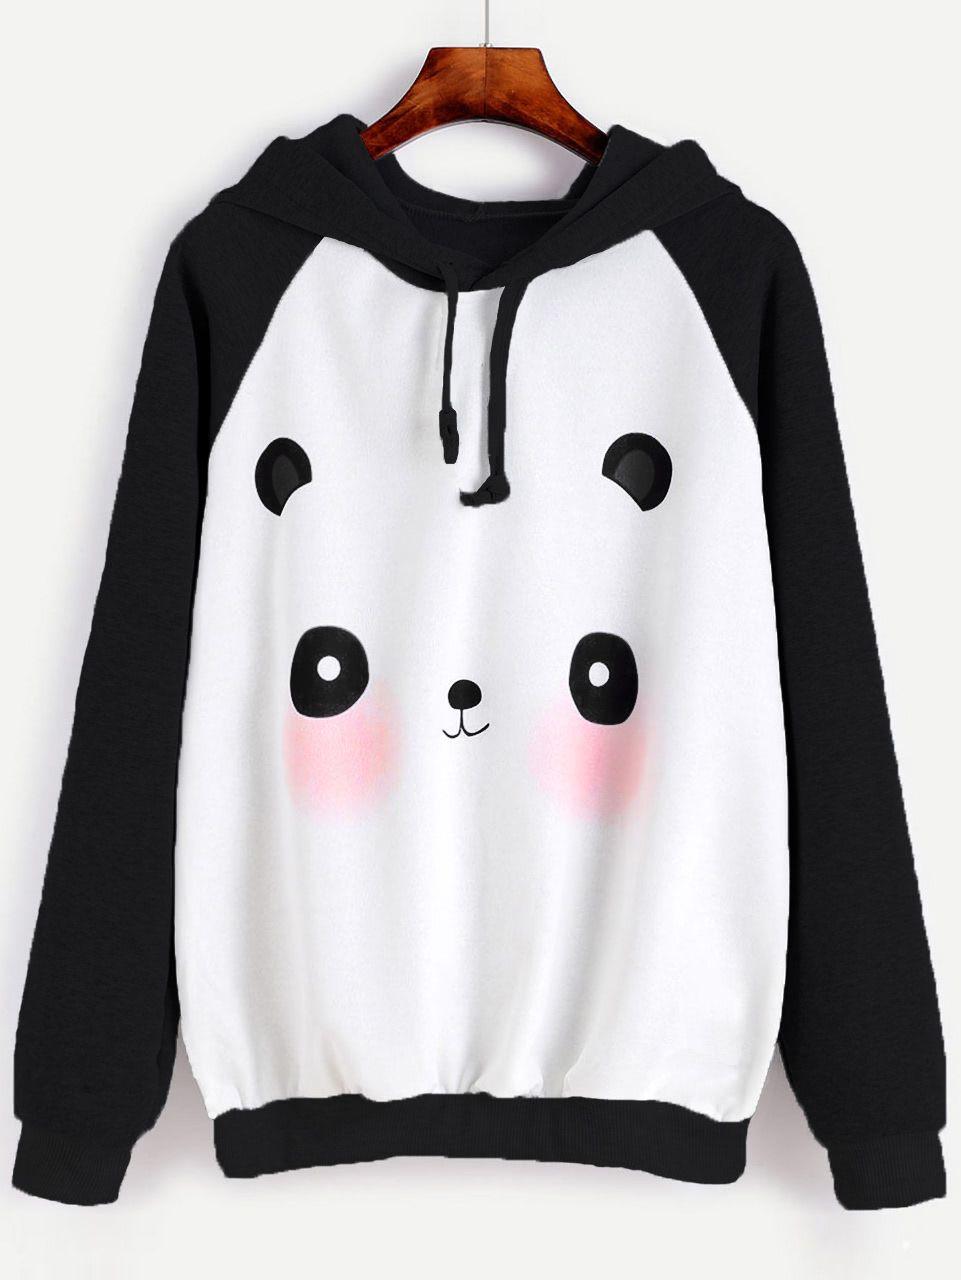 da7a70306 Shop Cartoon Panda Print Raglan Hoodie online. SheIn offers Cartoon Panda  Print Raglan Hoodie & more to fit your fashionable needs.